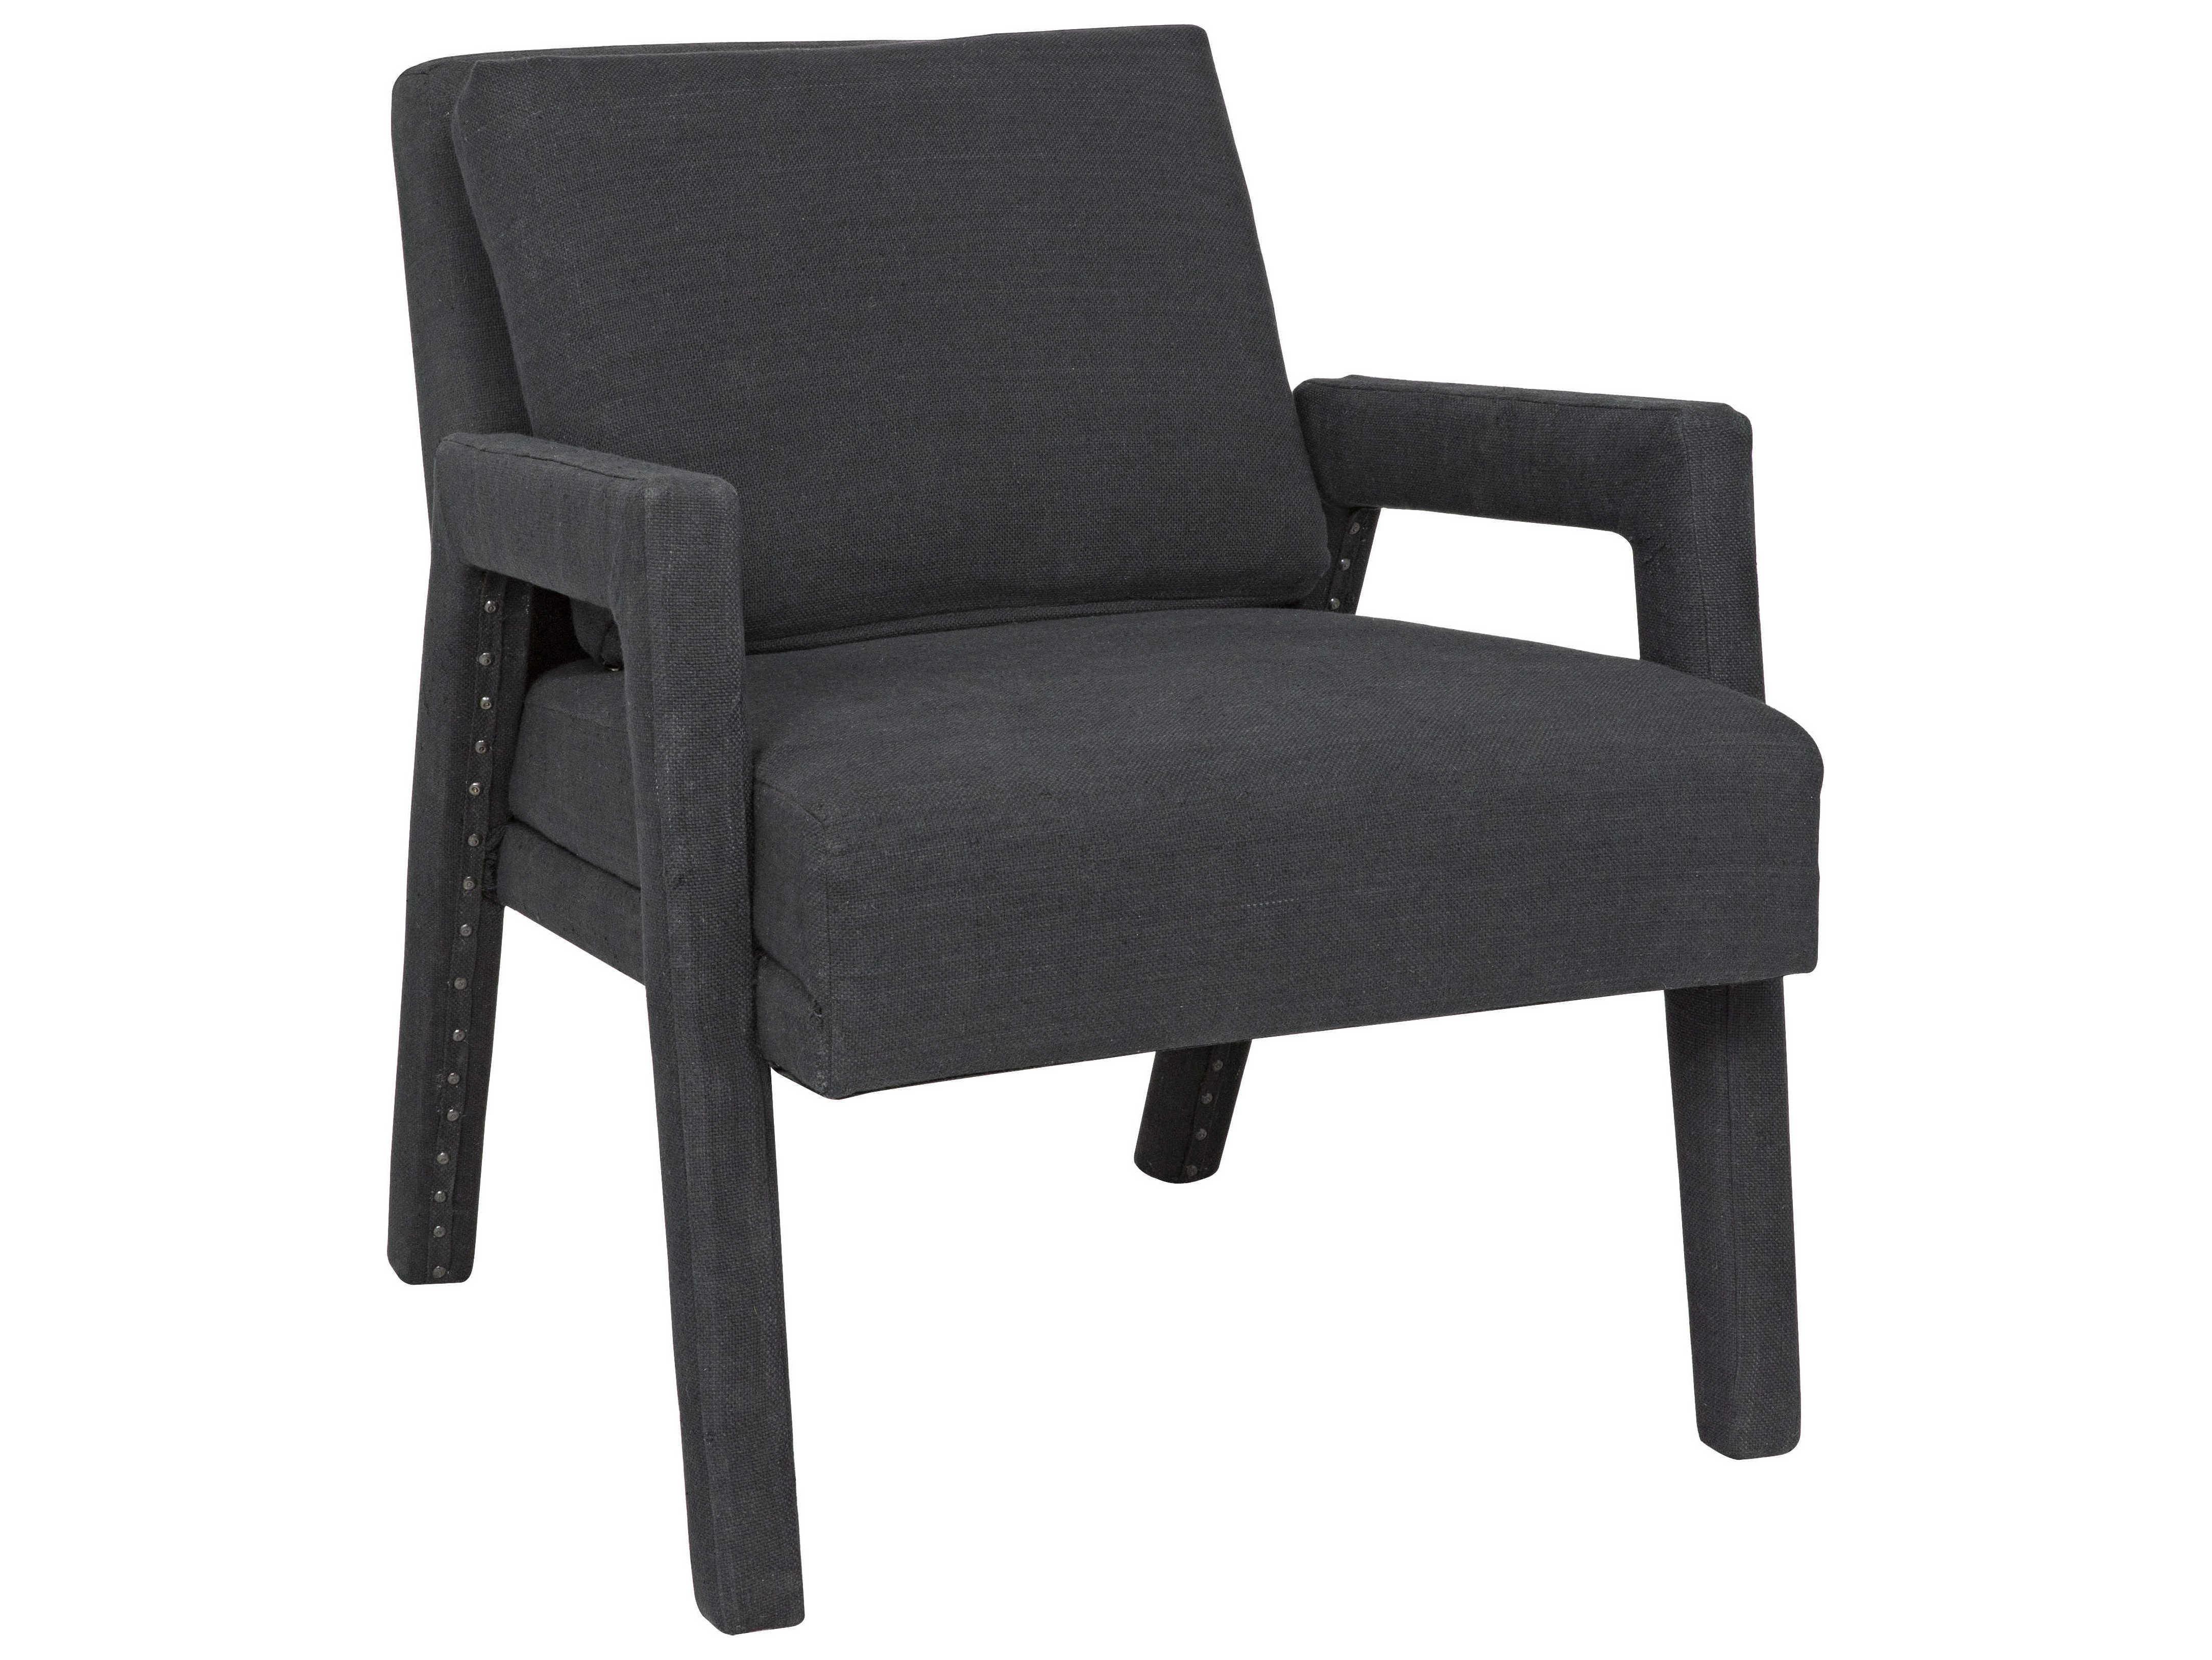 noir dining chairs lsu rocking chair cushions furniture widow black arm noigcha276